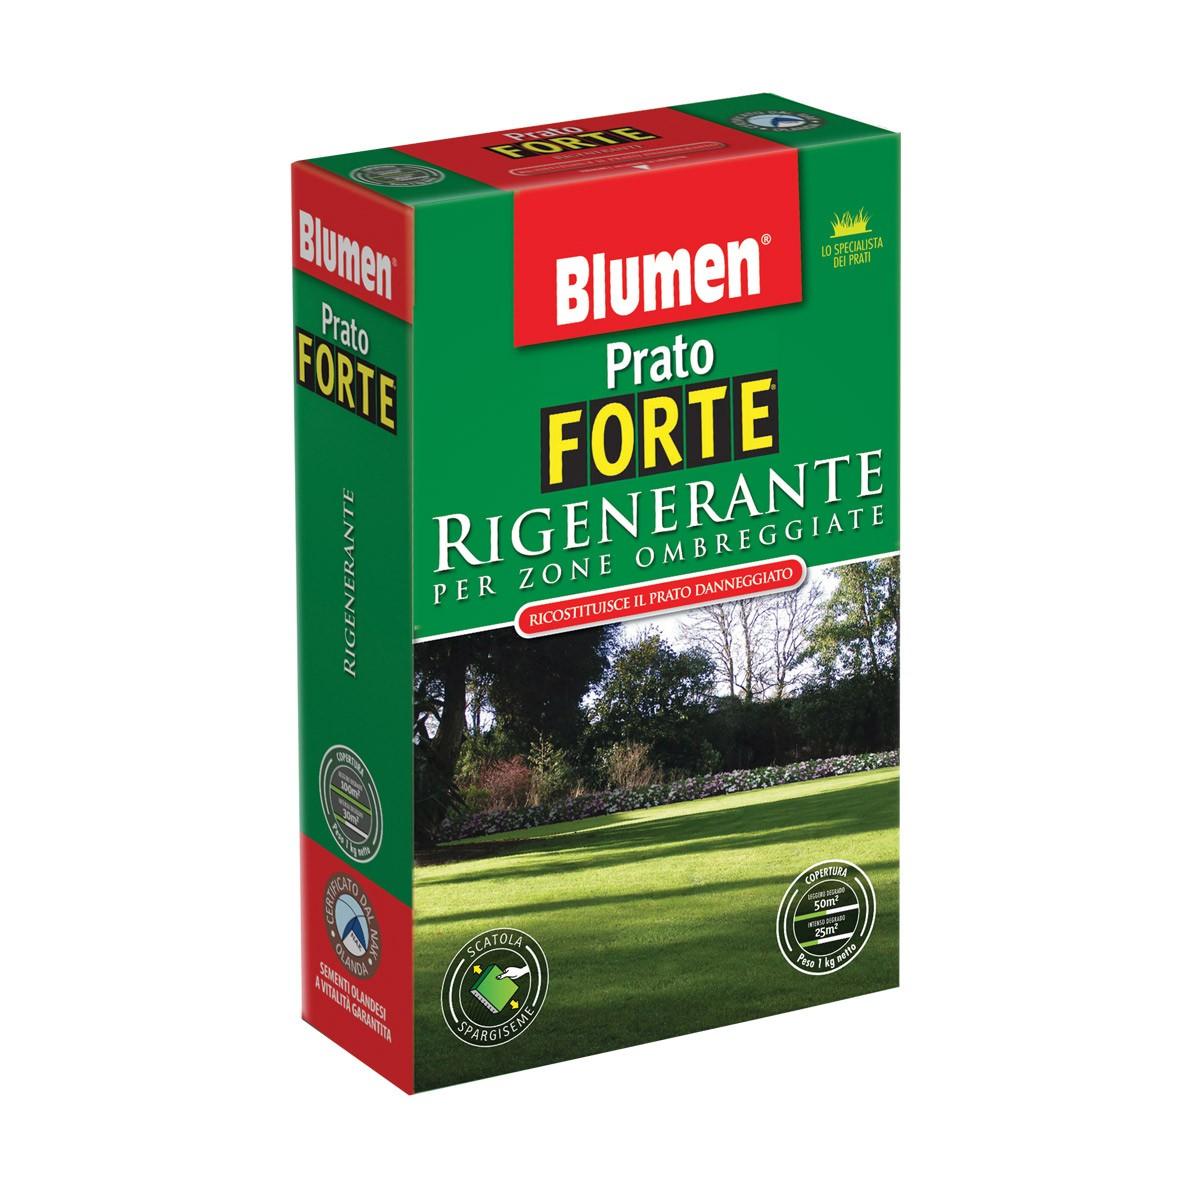 Prato Forte Rigenerante Ombra 500 Gr